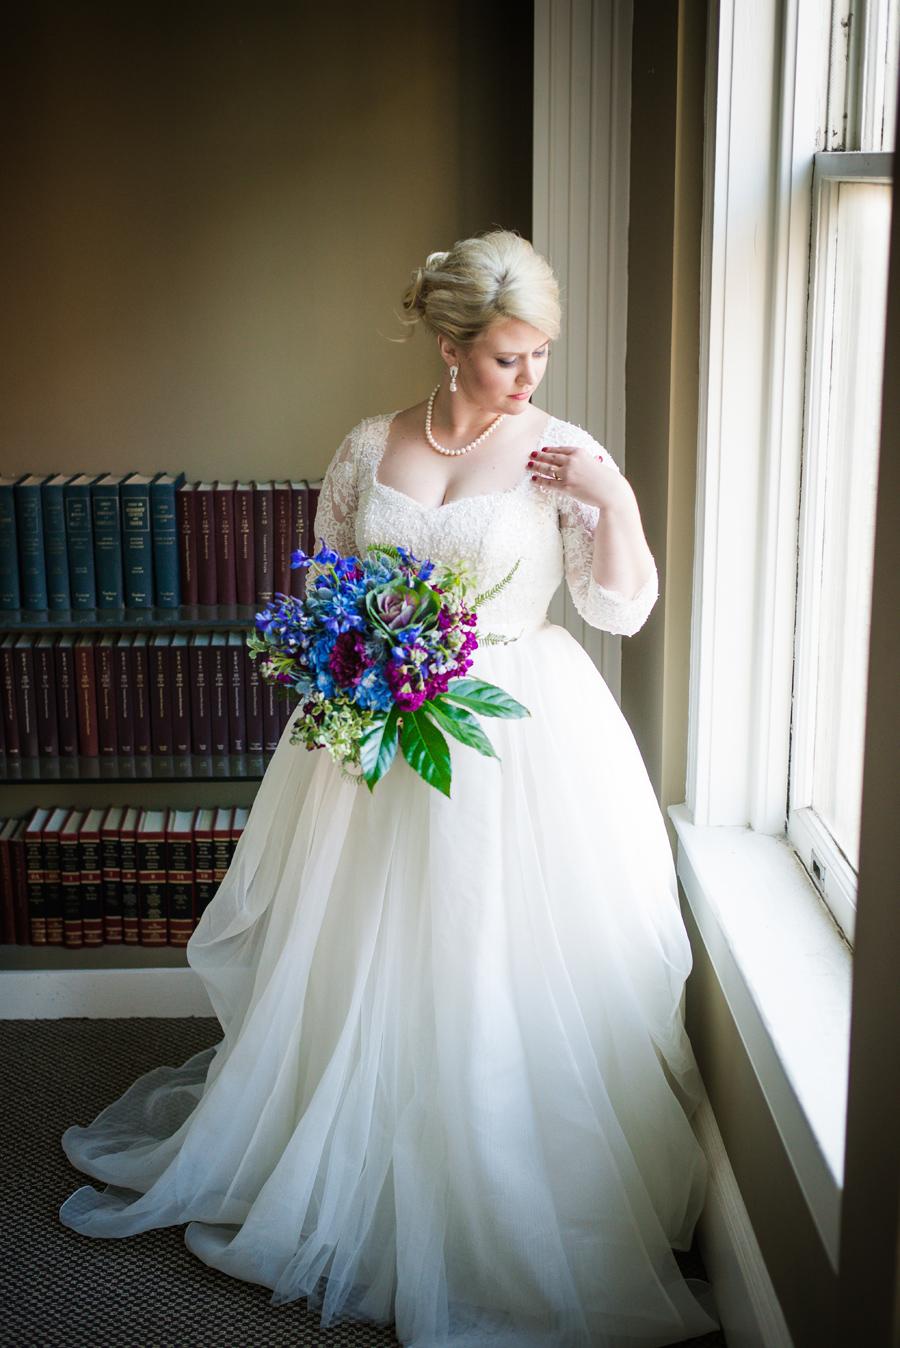 Wedding Dress Shops In Arkansas 42 Best Such a sweet wedding